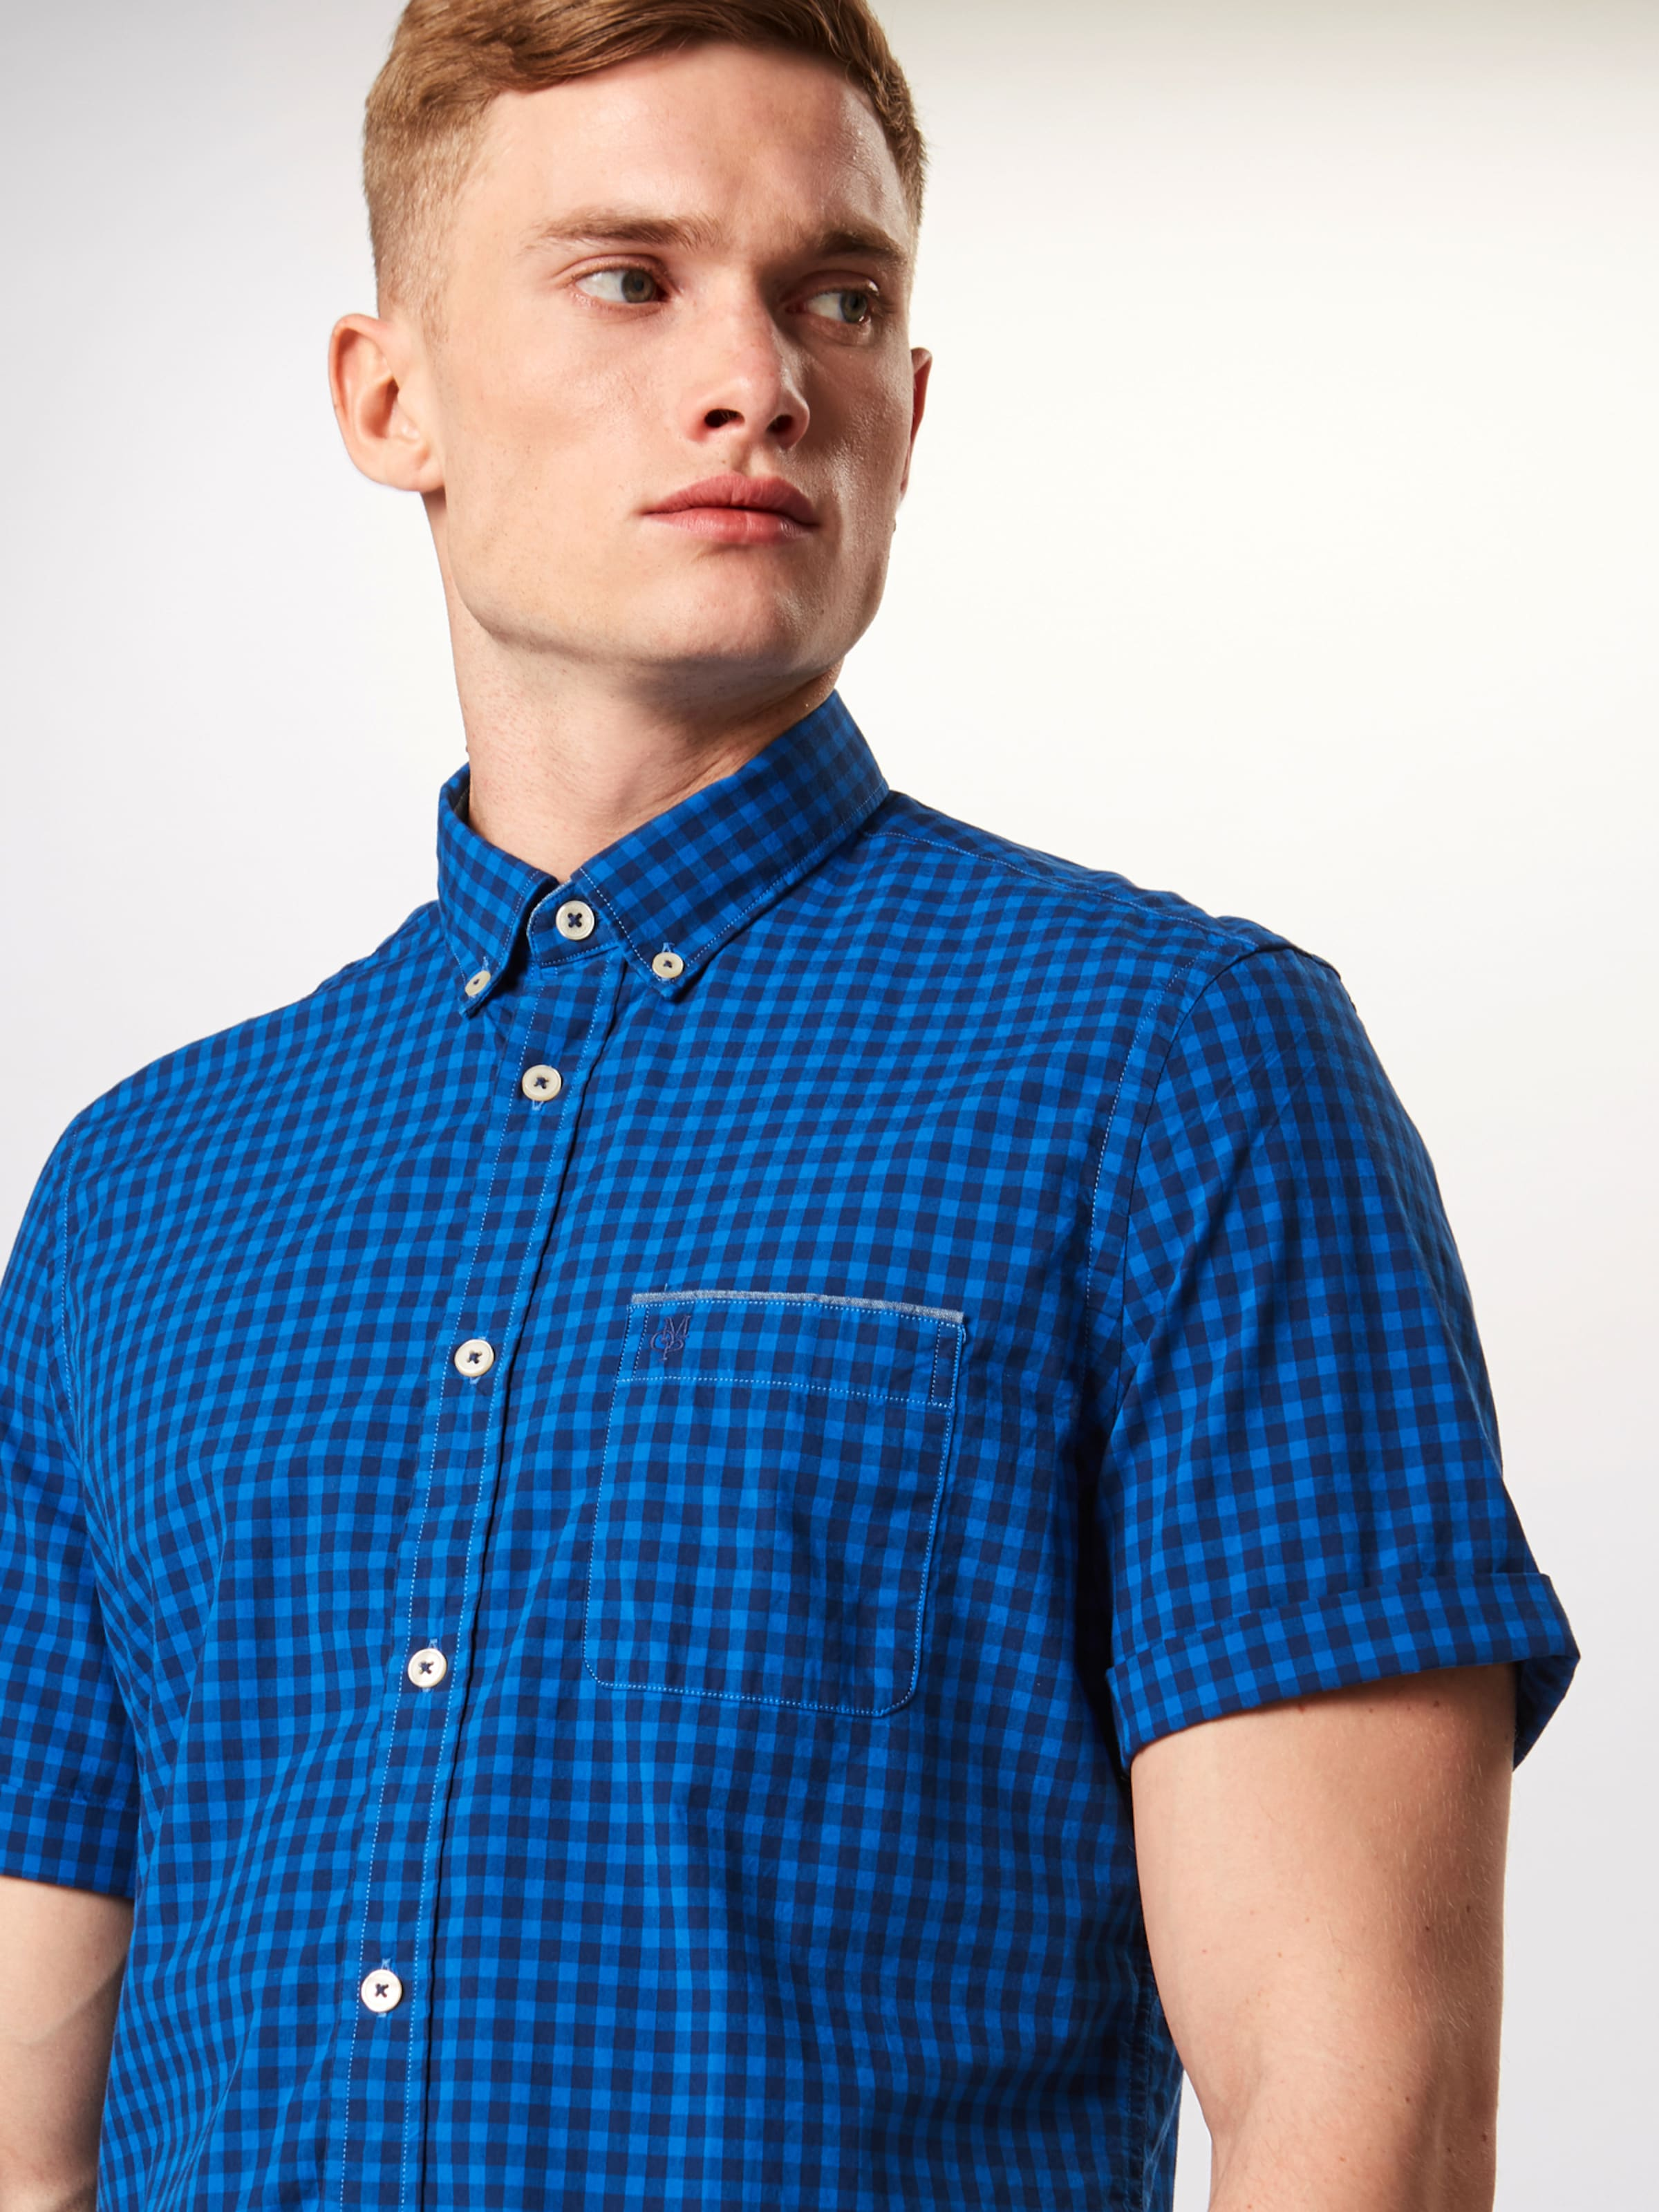 Bleu Sleeve' blouses En Marc Chemise Short 'shirts O'polo nk0Z8ONXwP